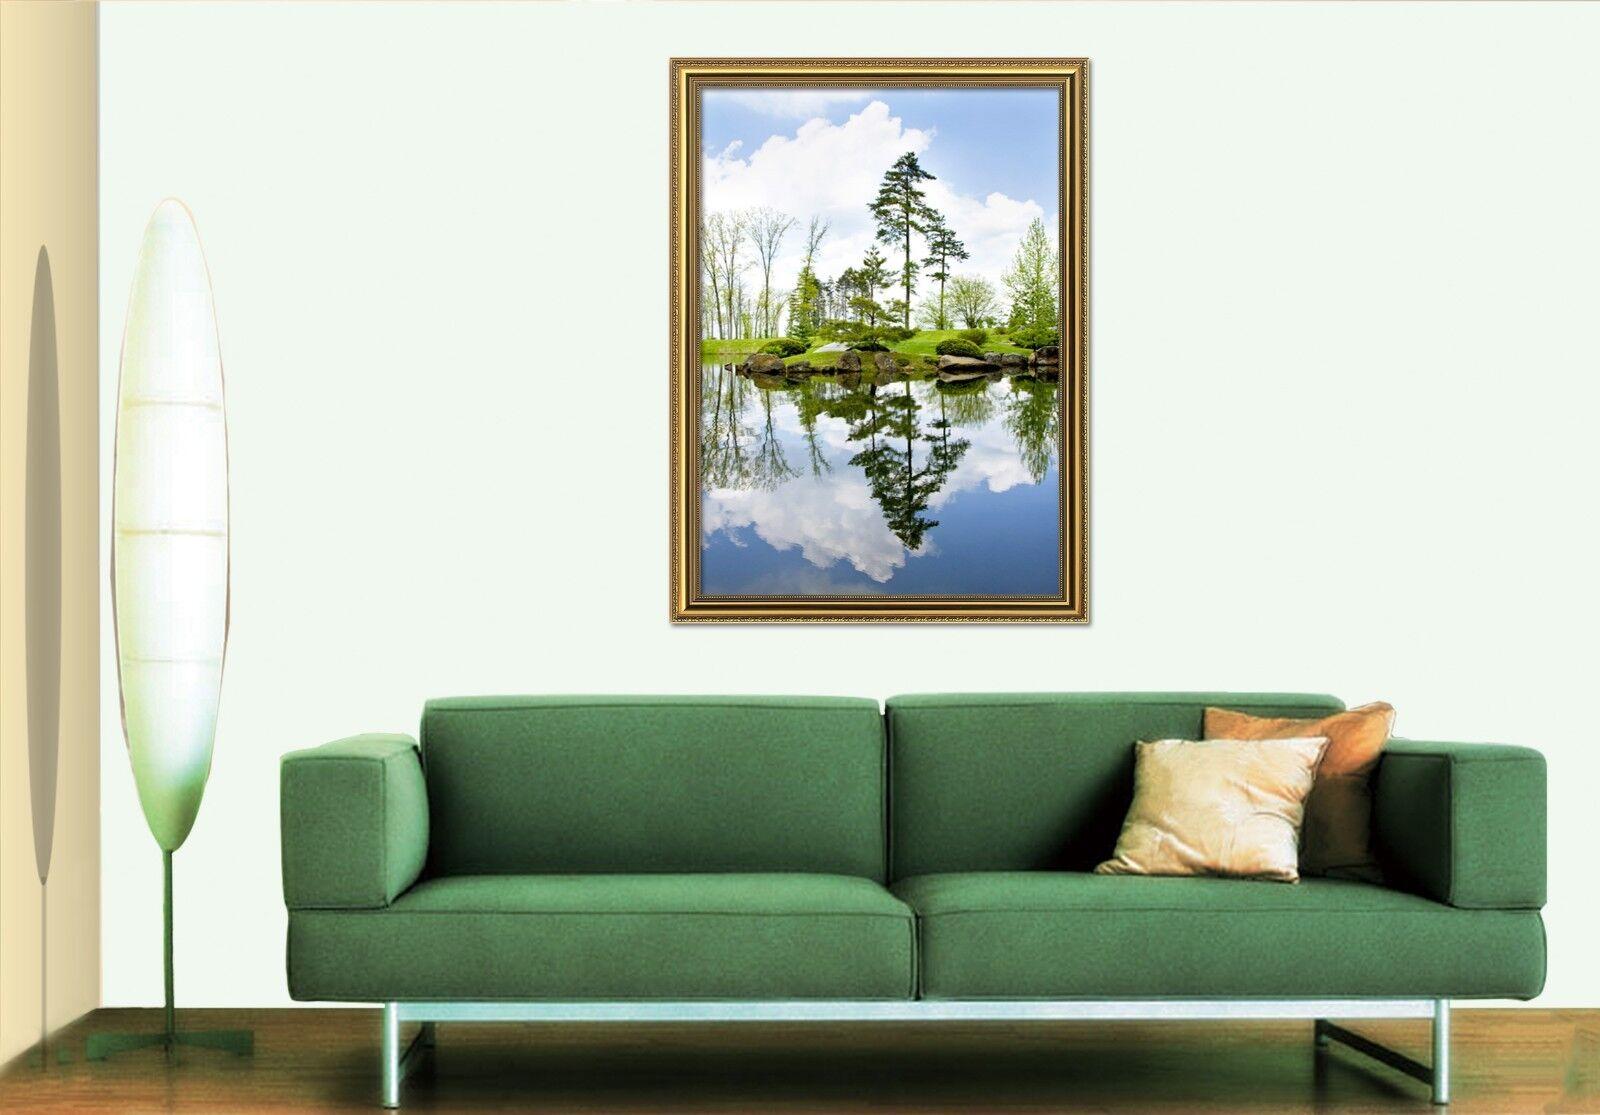 3D Riverside View 557 Fake Framed Poster Home Decor Drucken Painting Unique Kunst